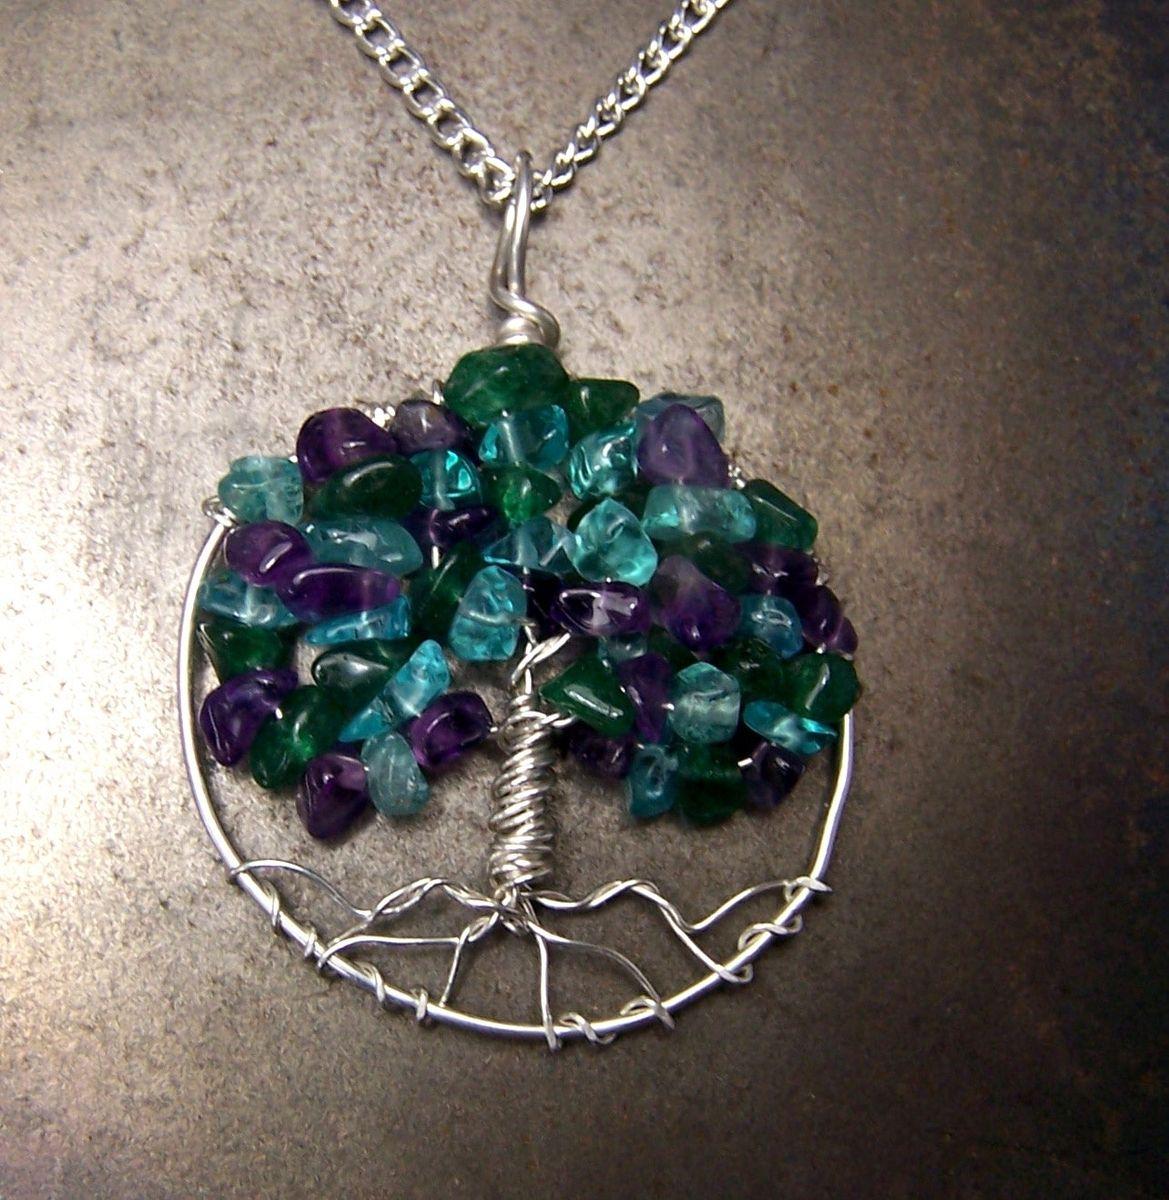 Buy a custom small family tree birthstone necklace grandmothers custom made small family tree birthstone necklace grandmothers mothers necklace aloadofball Gallery